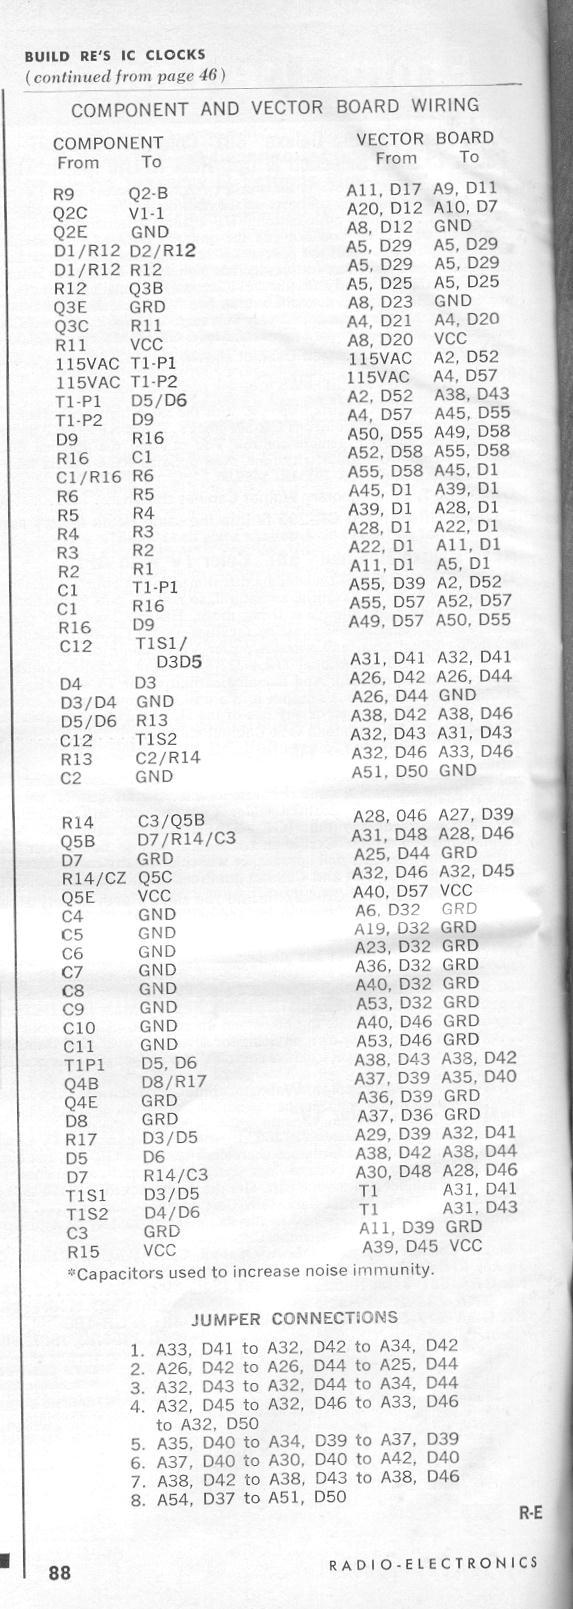 Radio-Electronics Display Articles